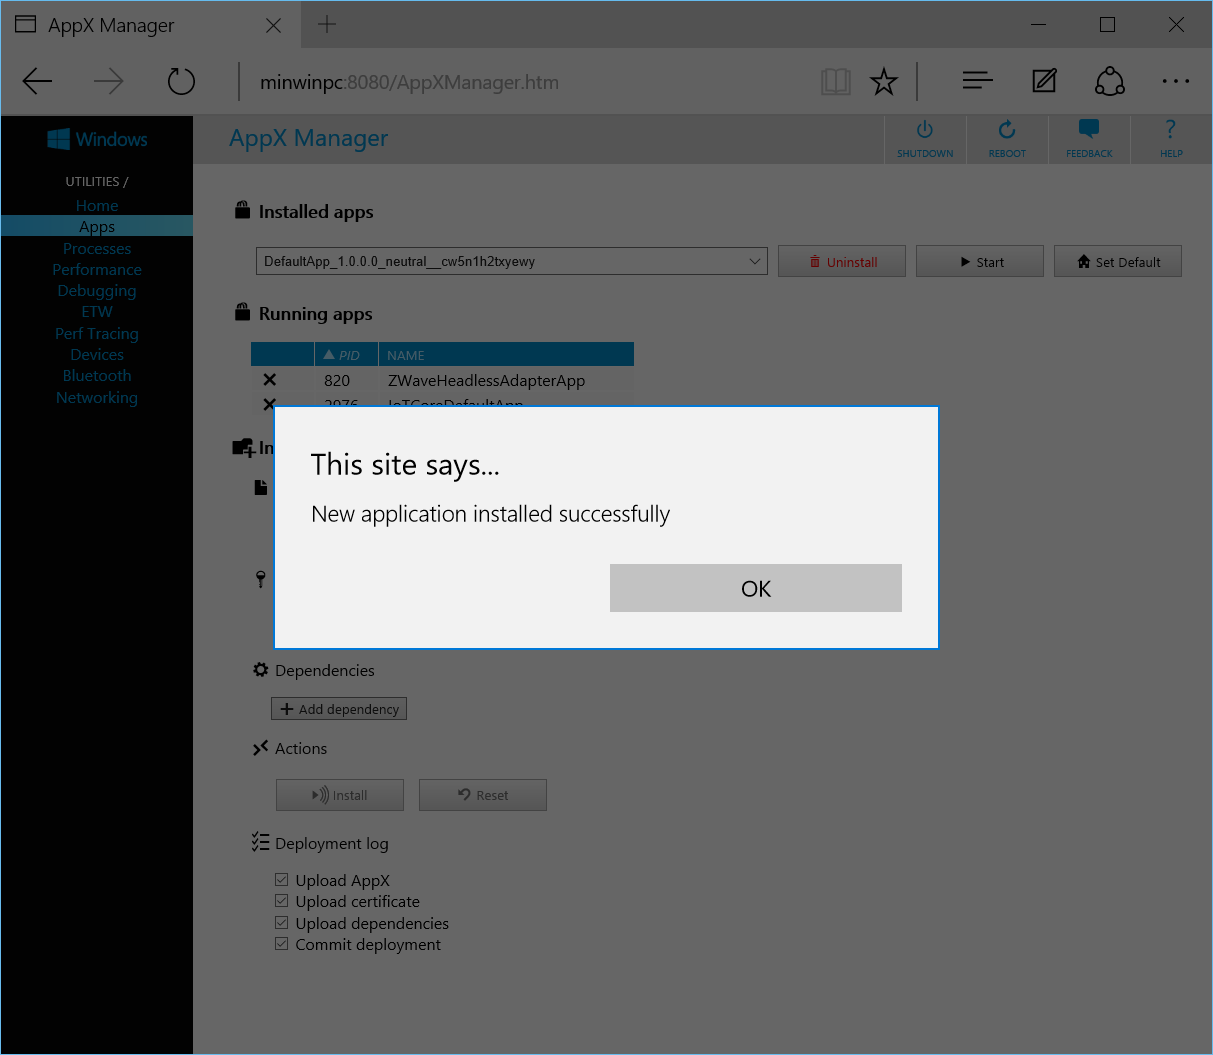 windows 10 iot core appx manager error code  0x80004005